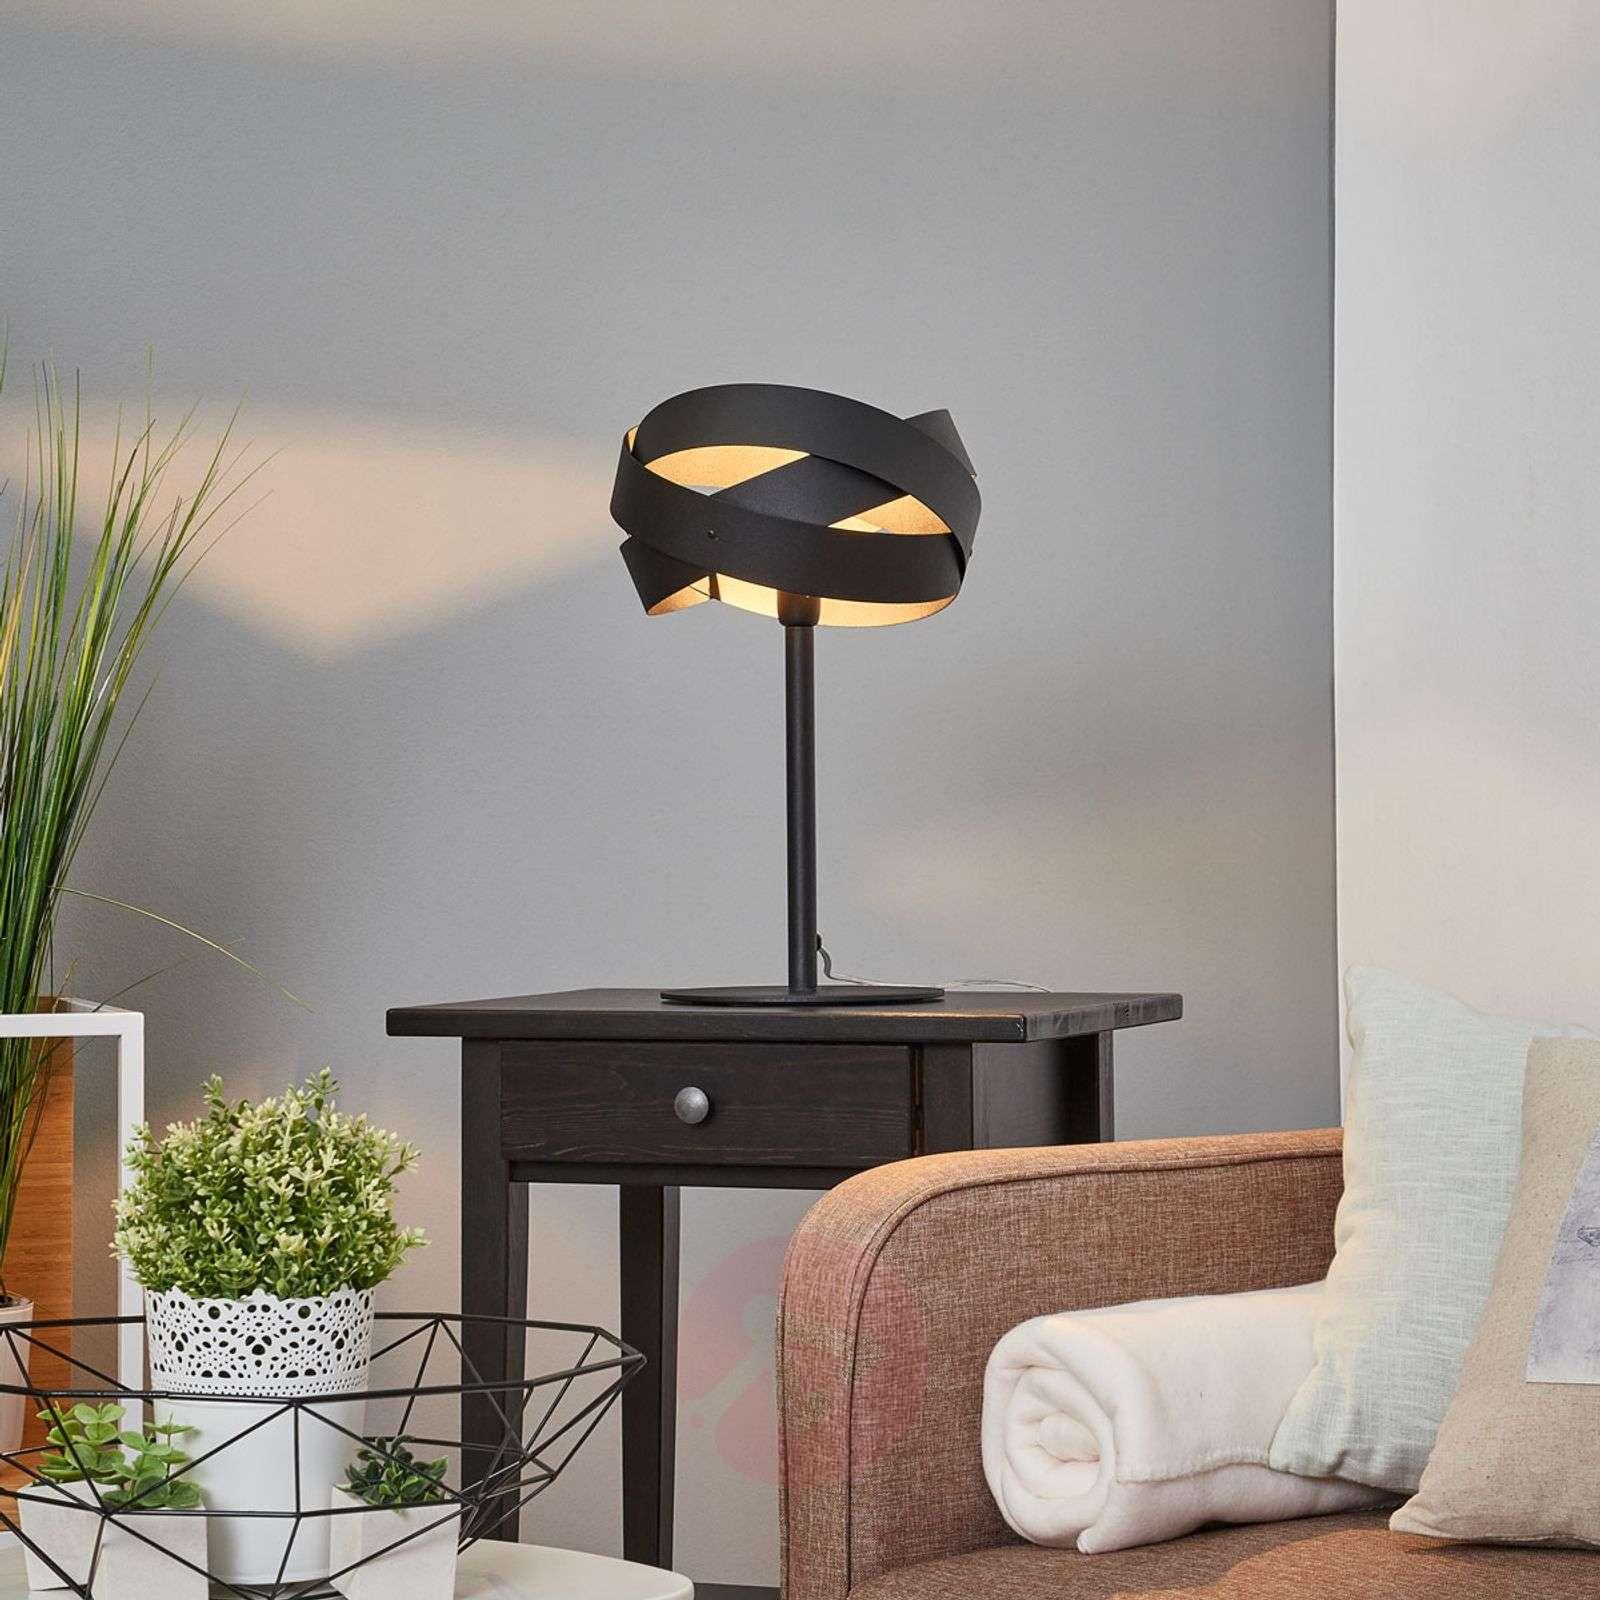 Decorative Tornado table lamp-6089027-01